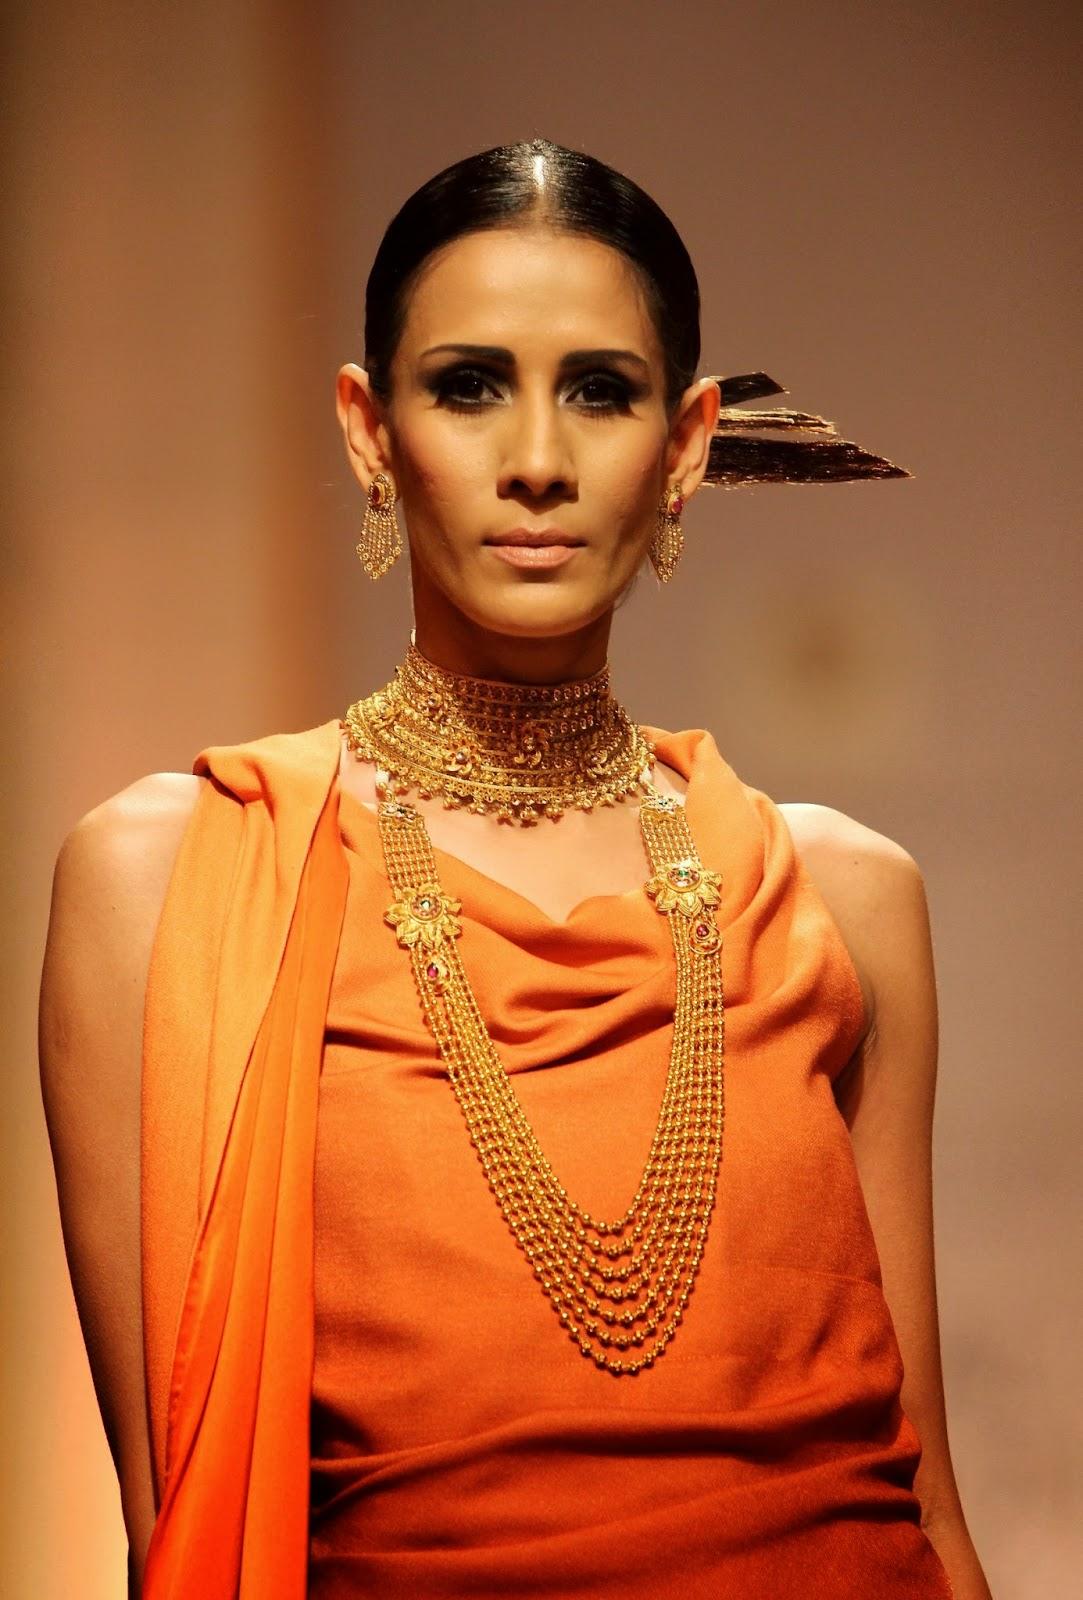 The Glitzy World !!: Azva launches new gold bridal jewellery collection - photo#13